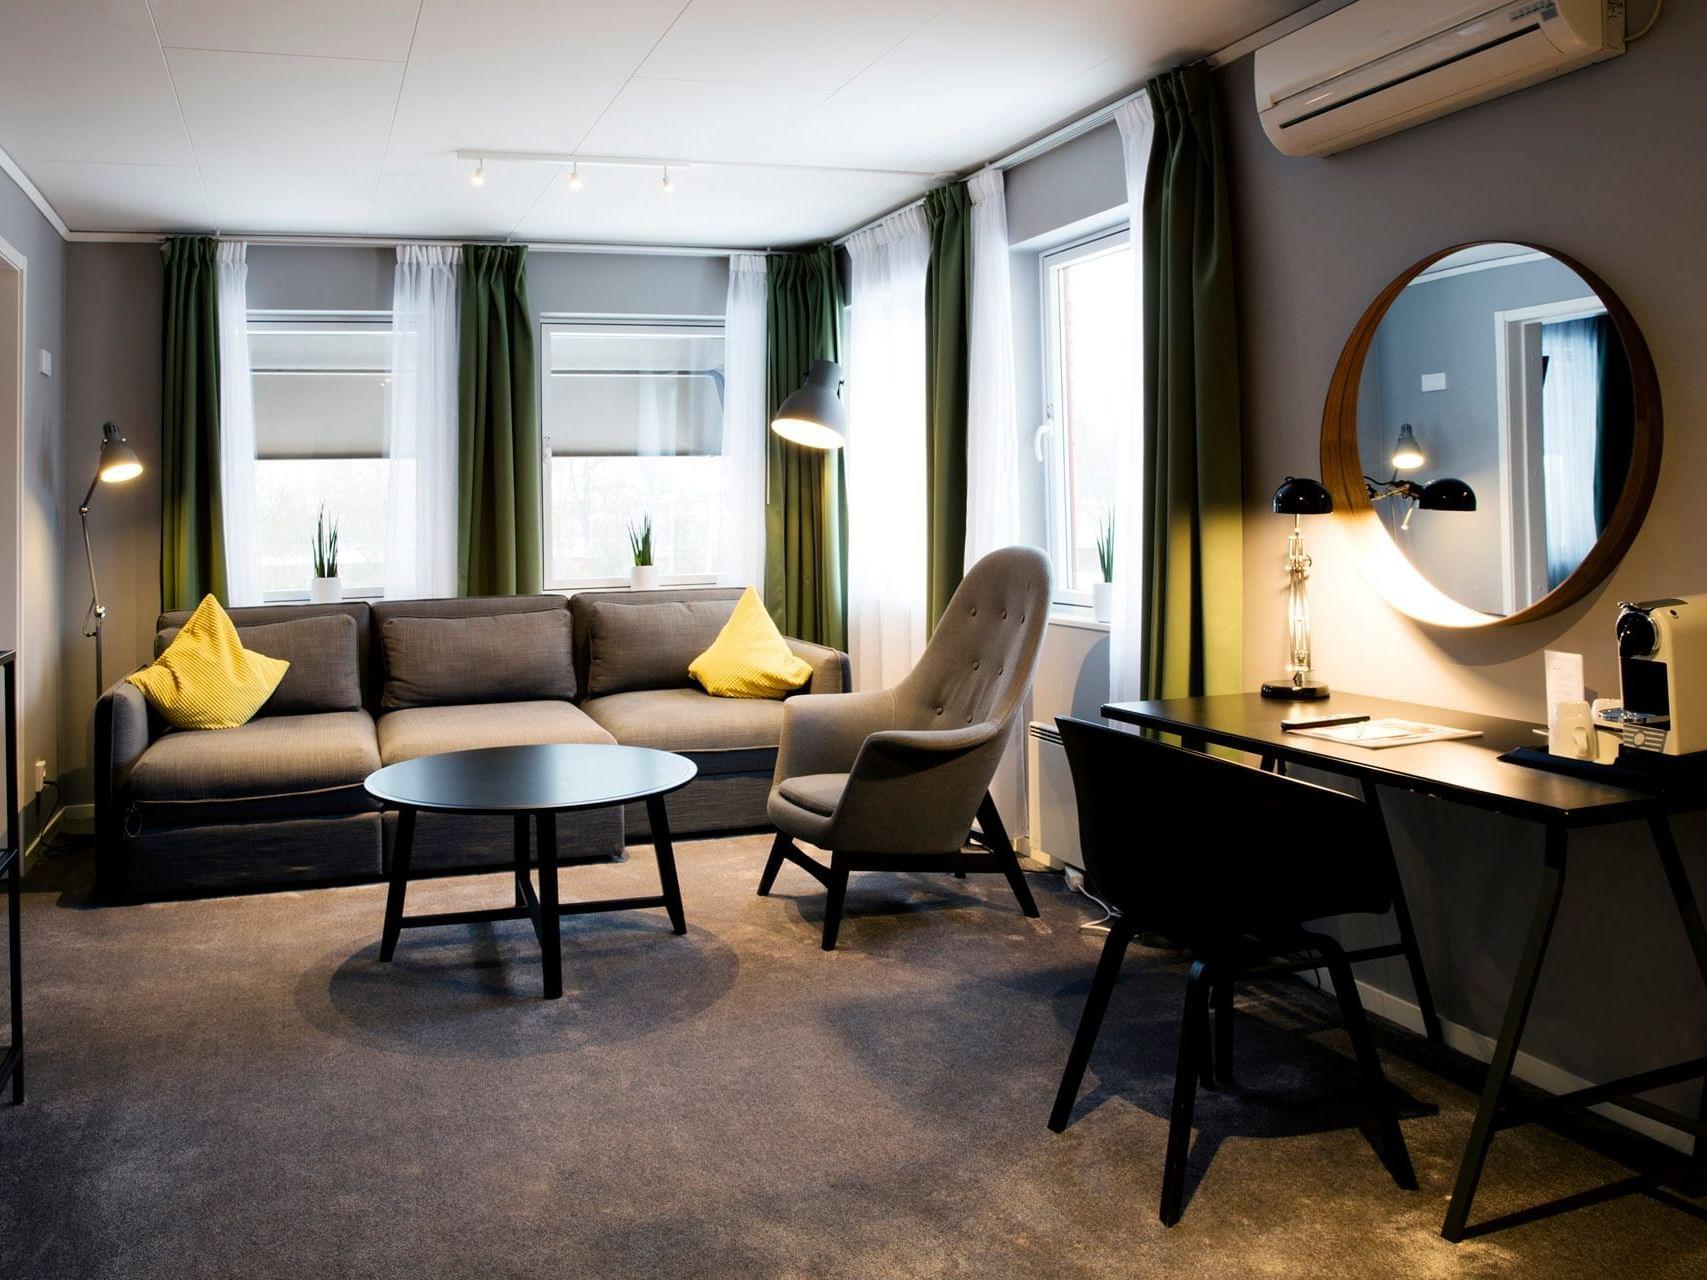 Executive King Room at Welcome Hotel in Järfälla, Sweden